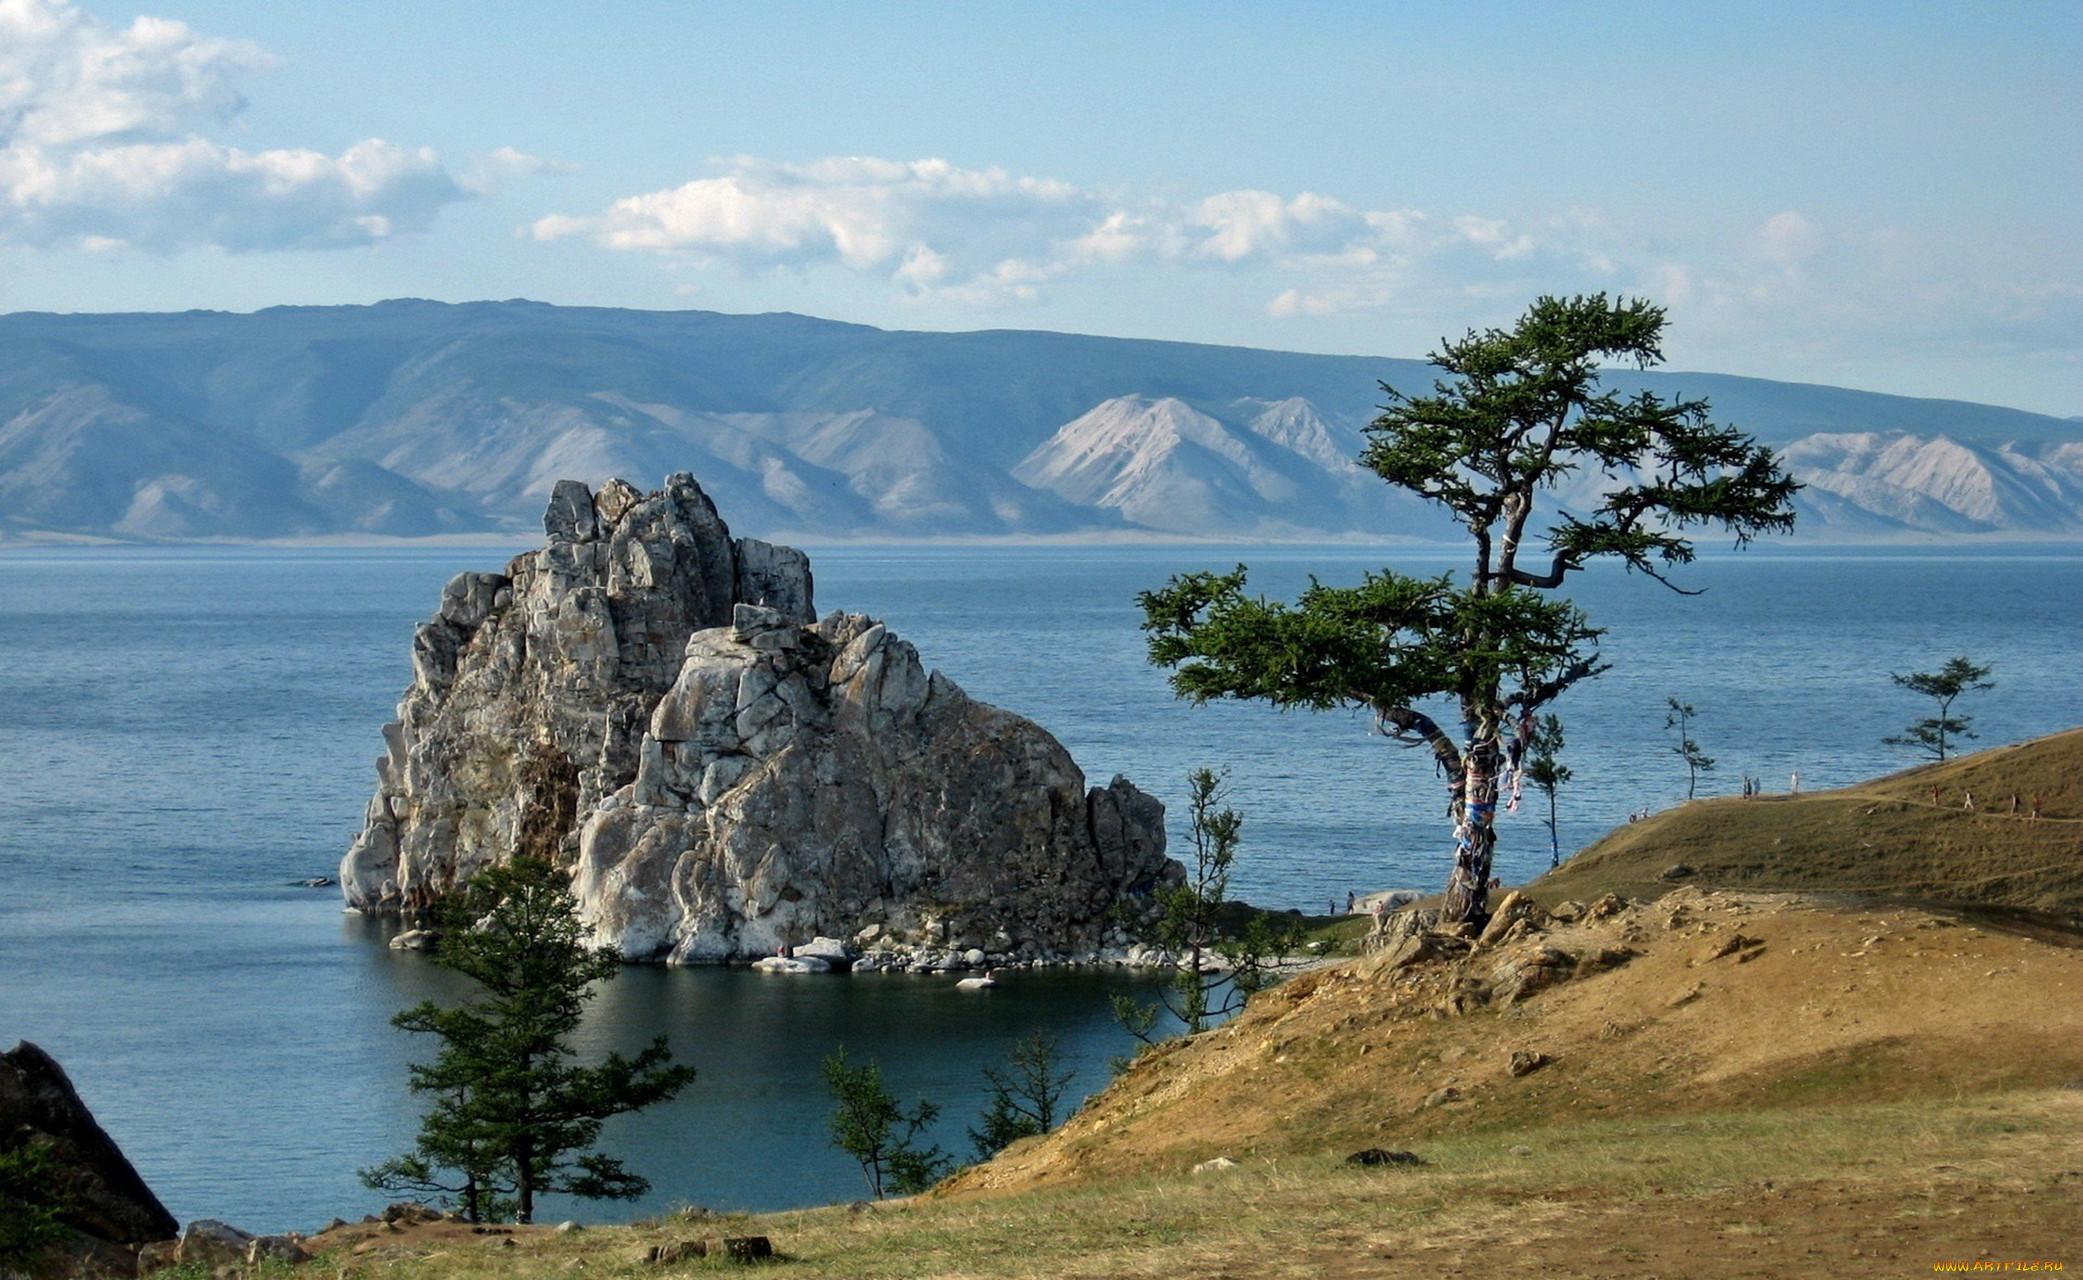 озеро байкал фото обои камнем семье